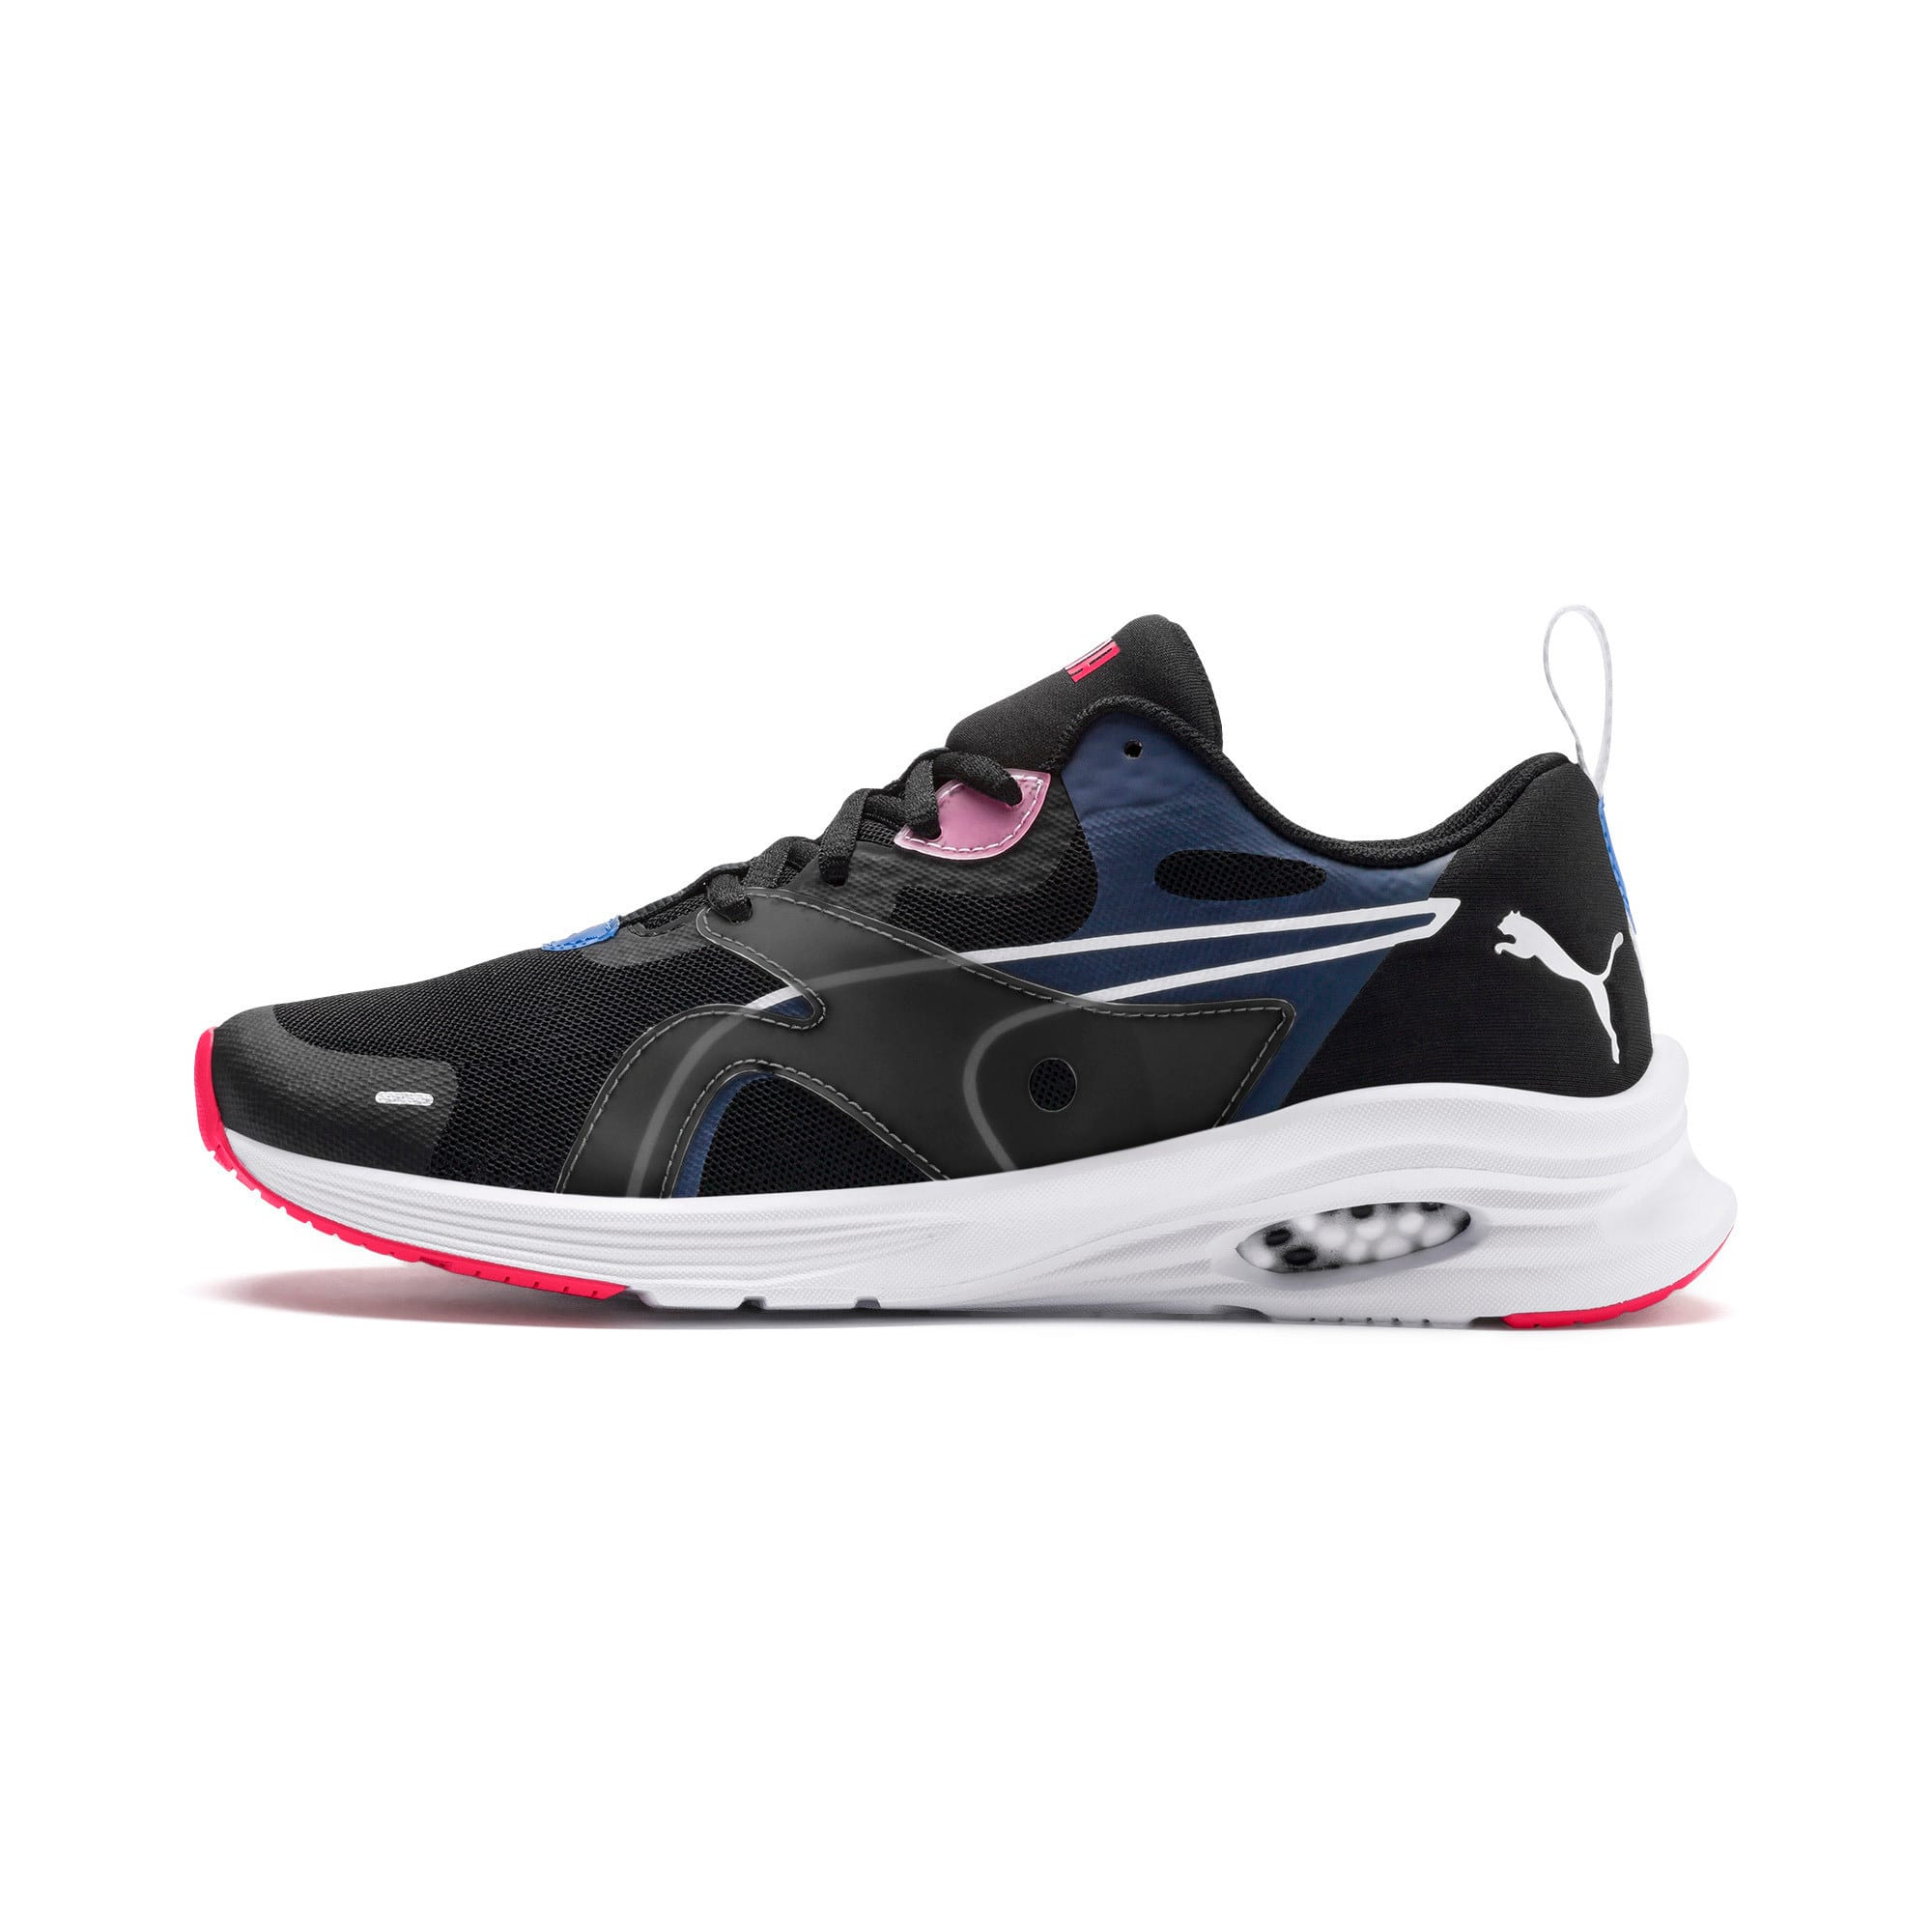 Thumbnail 1 of HYBRID Fuego Women's Running Shoes, Black-Blue Glimmer-Nrgy Rose, medium